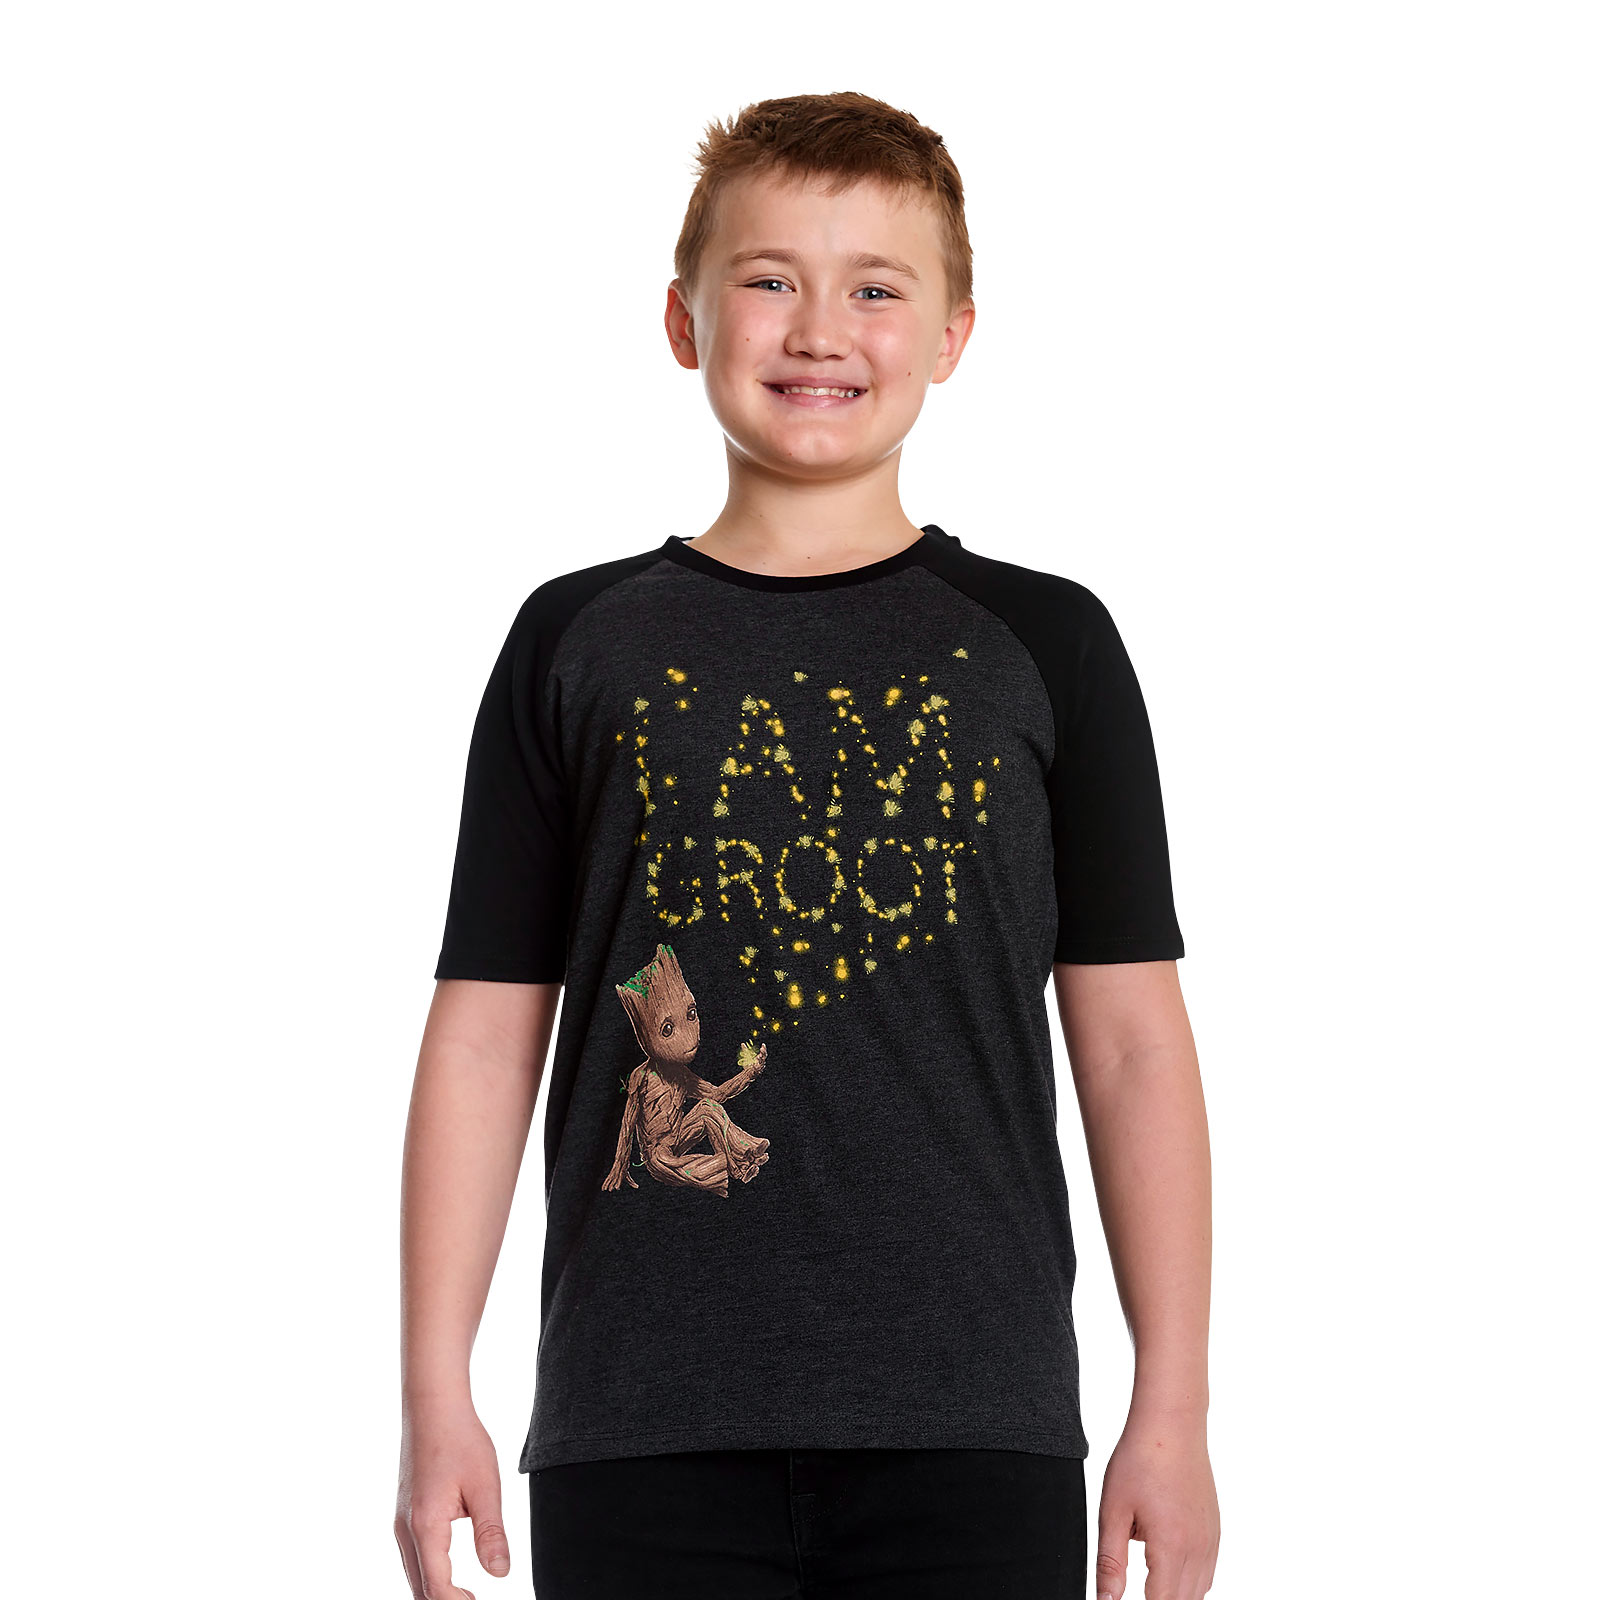 Guardians of the Galaxy - Groot Glow in the Dark T-Shirt Kinder grau